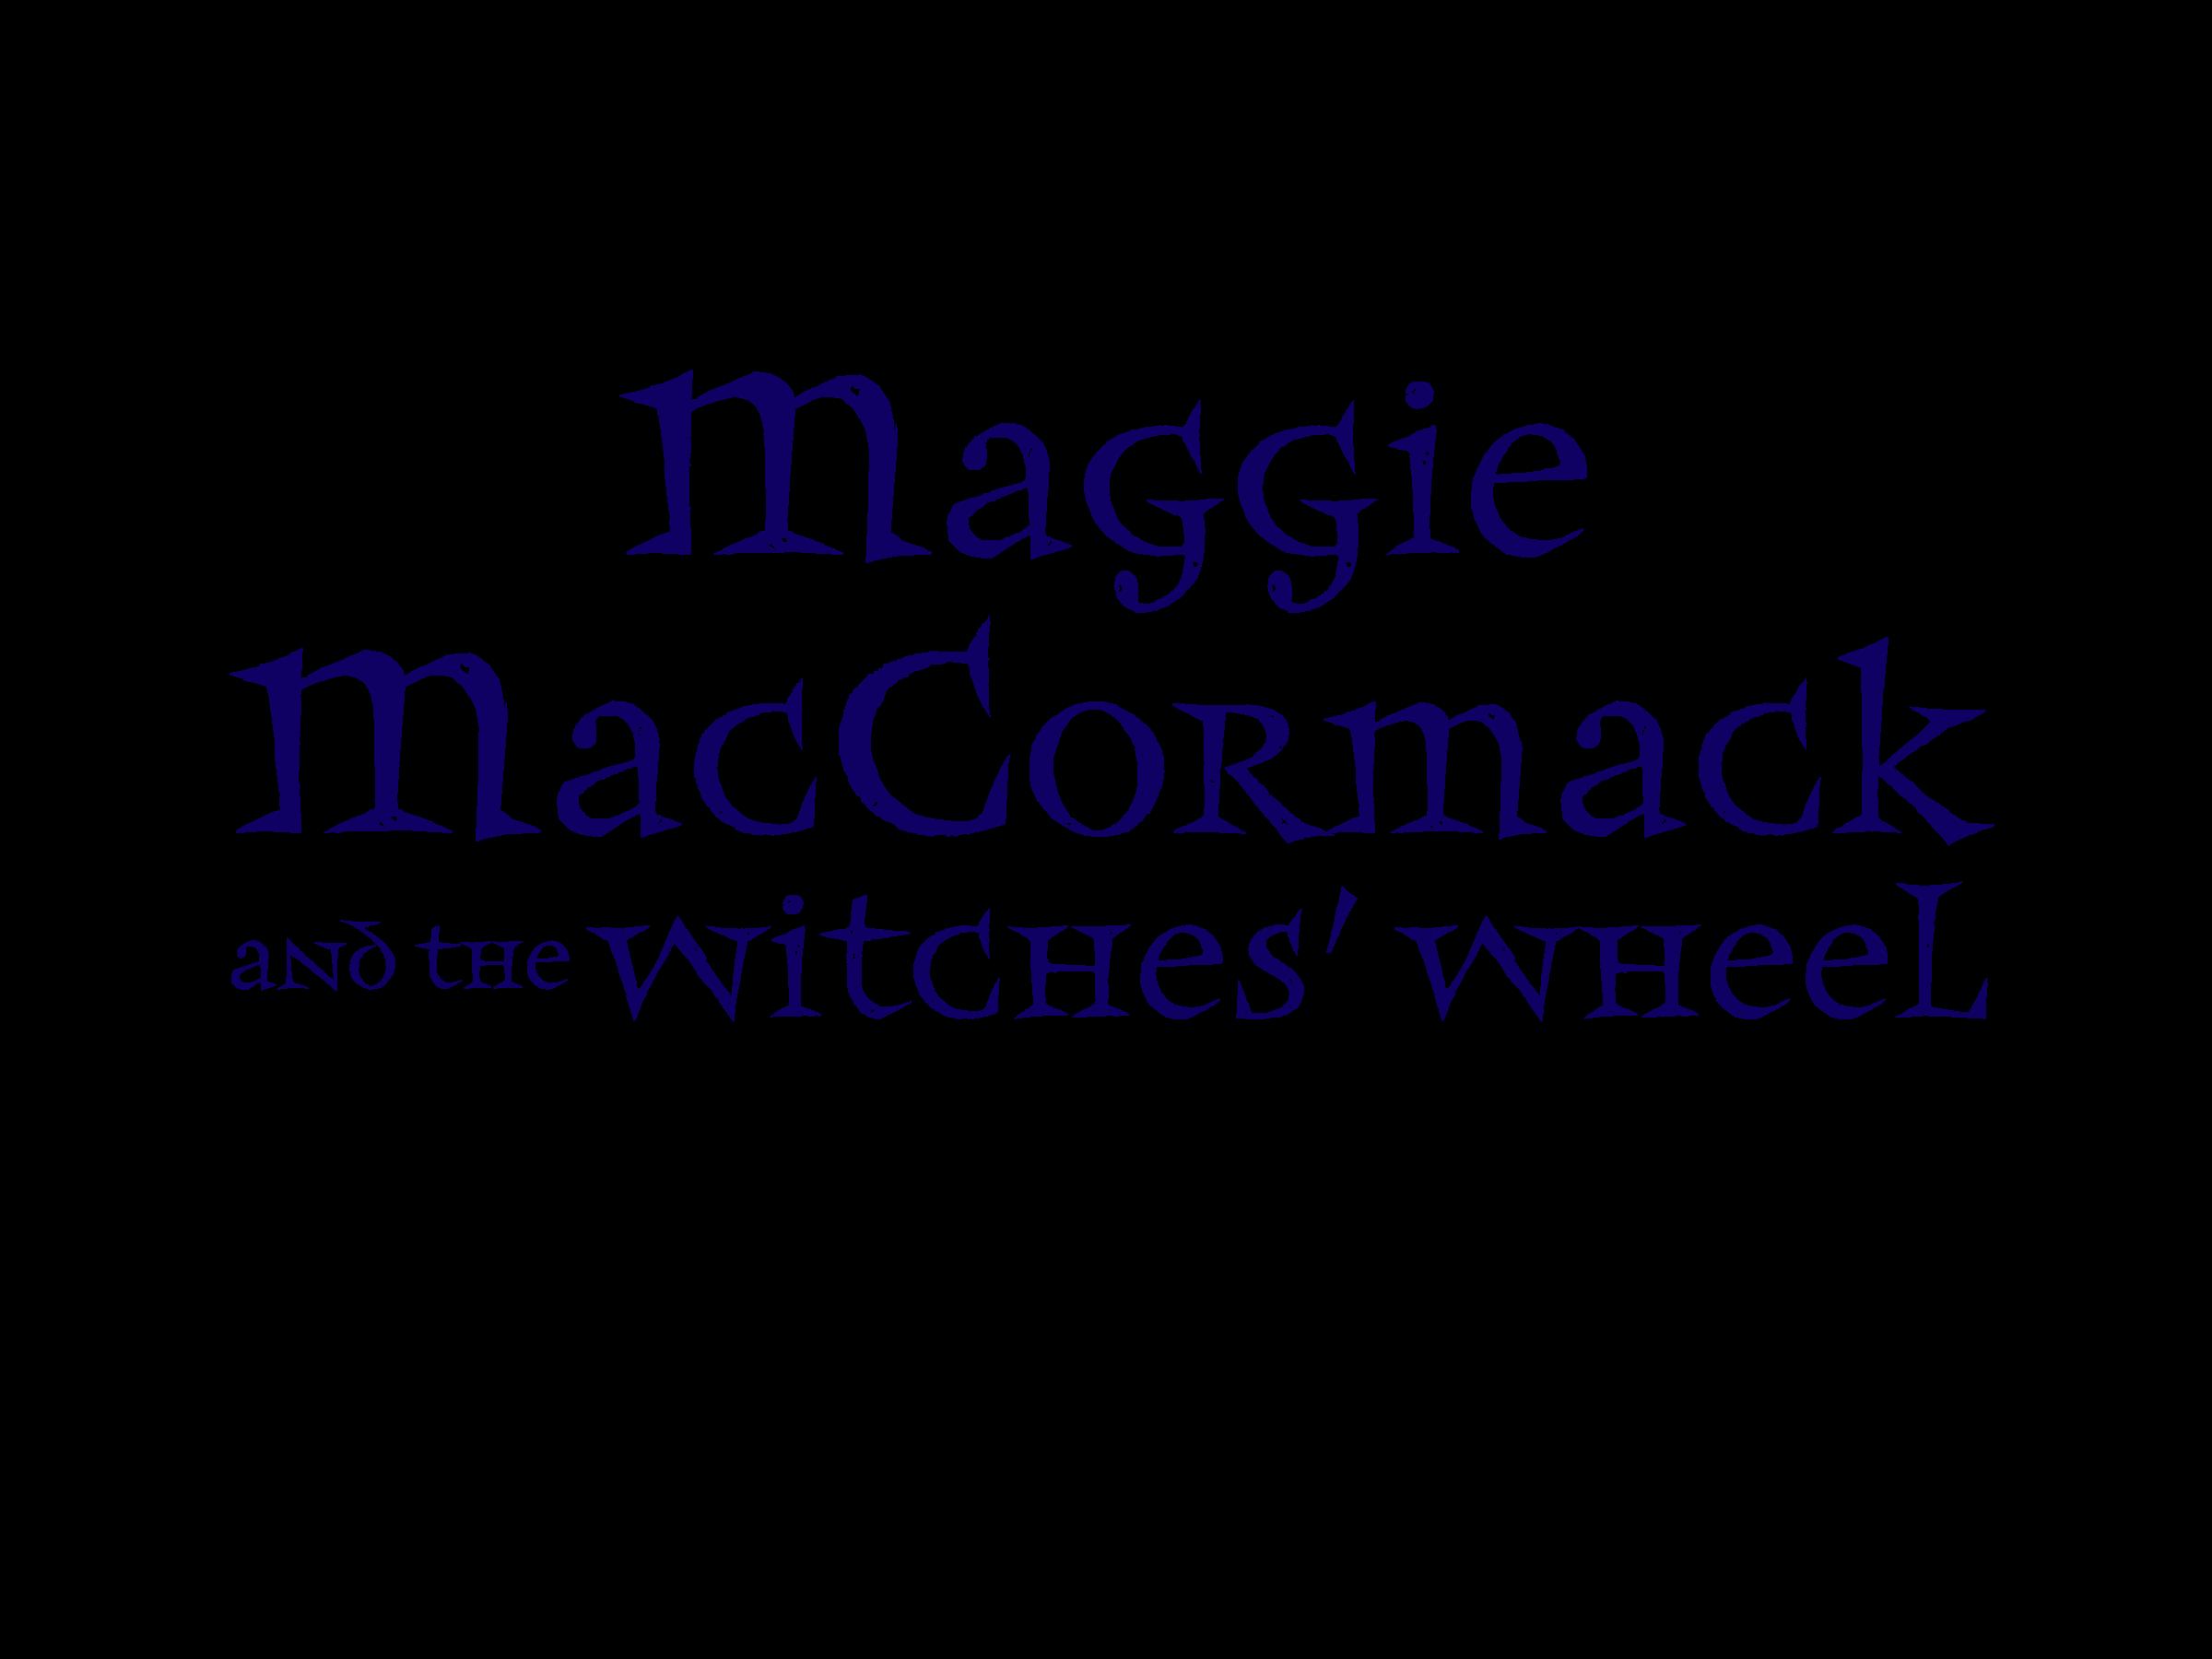 Maggie MacCormack-